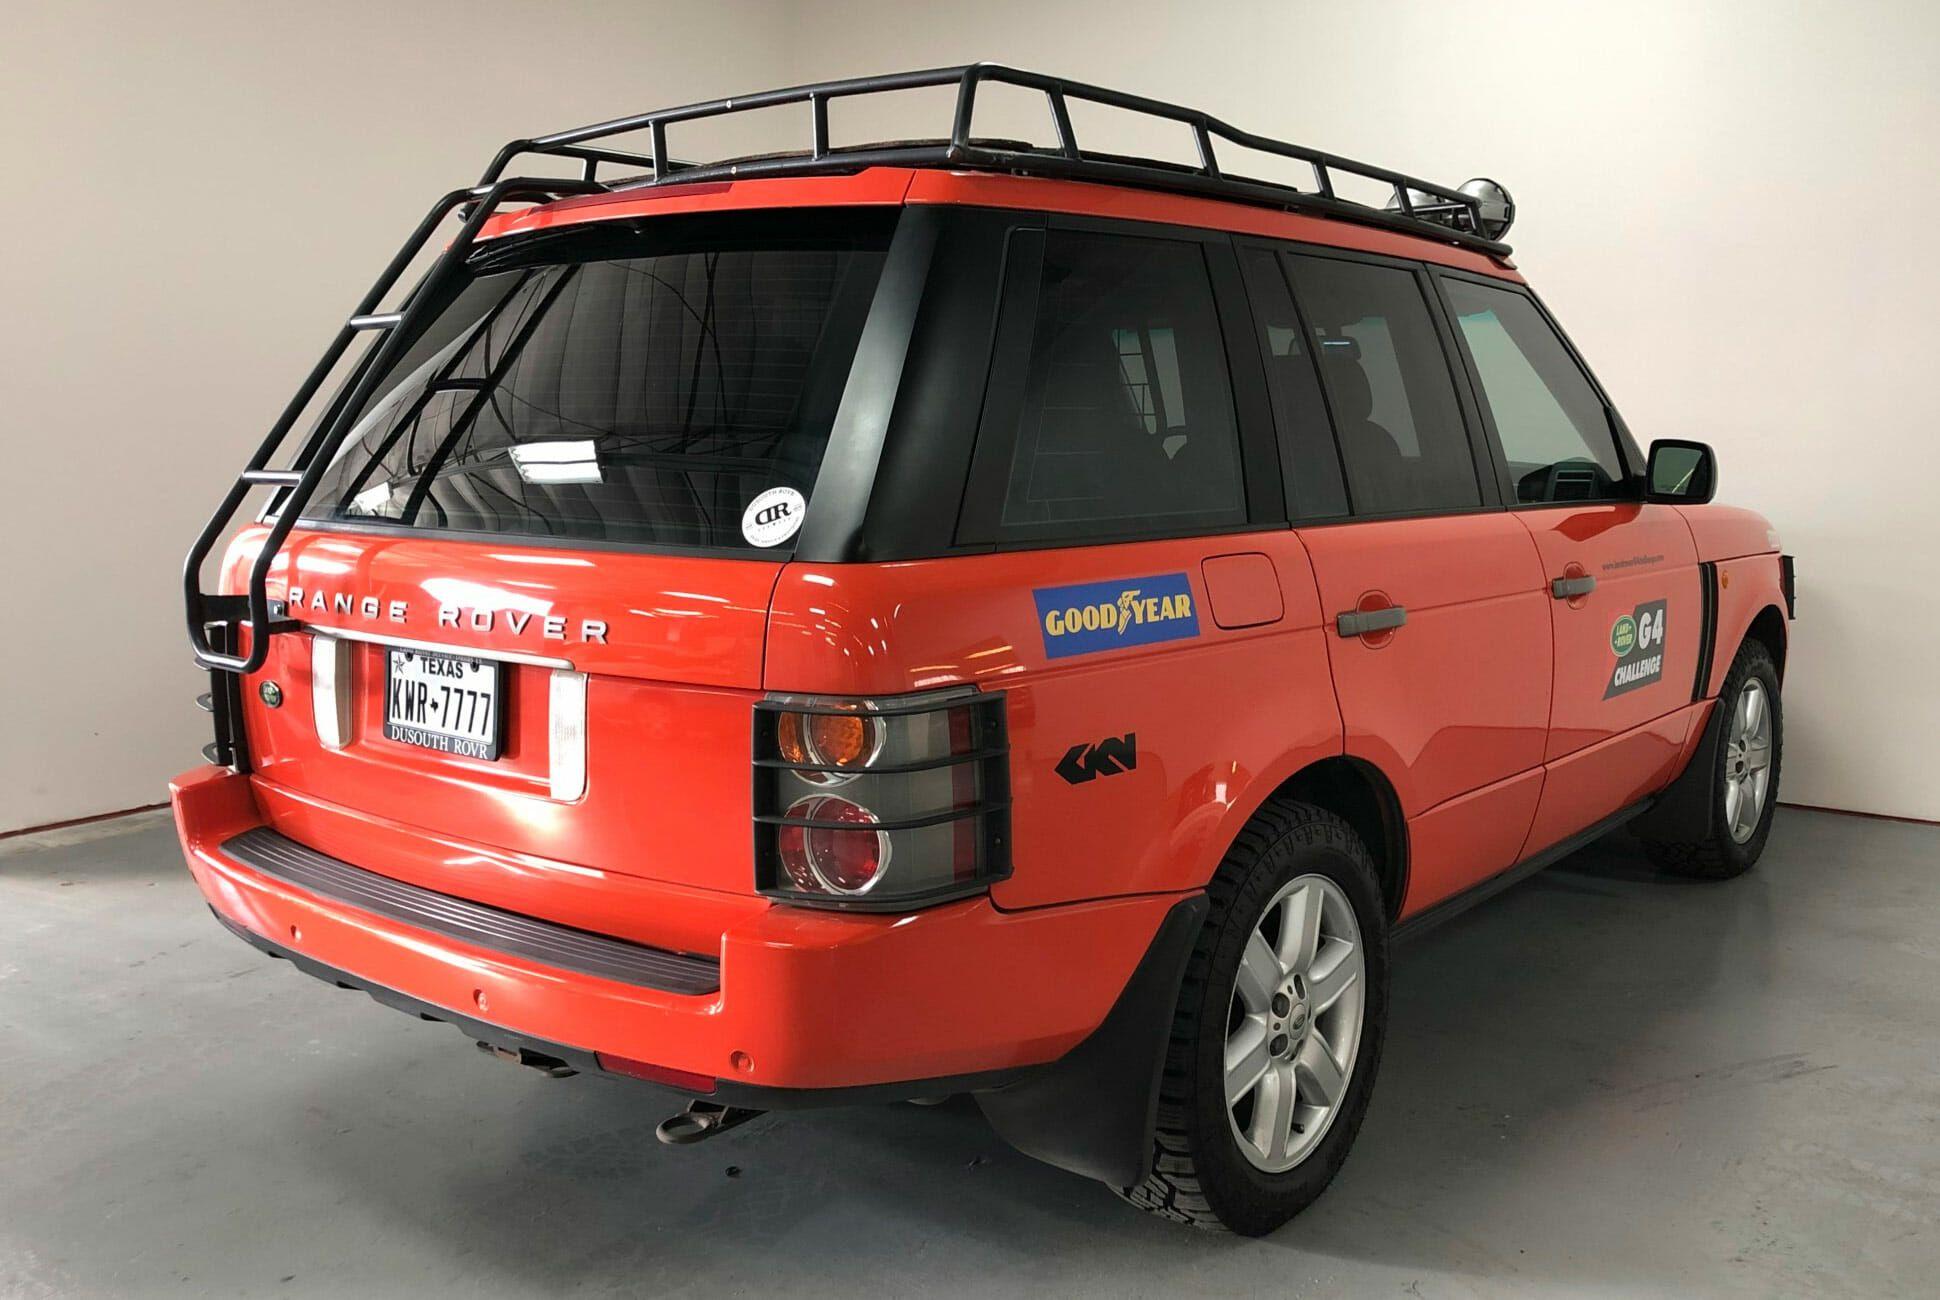 2003-Land-Rover-Range-Rover-G4-gear-patrol-slide-4